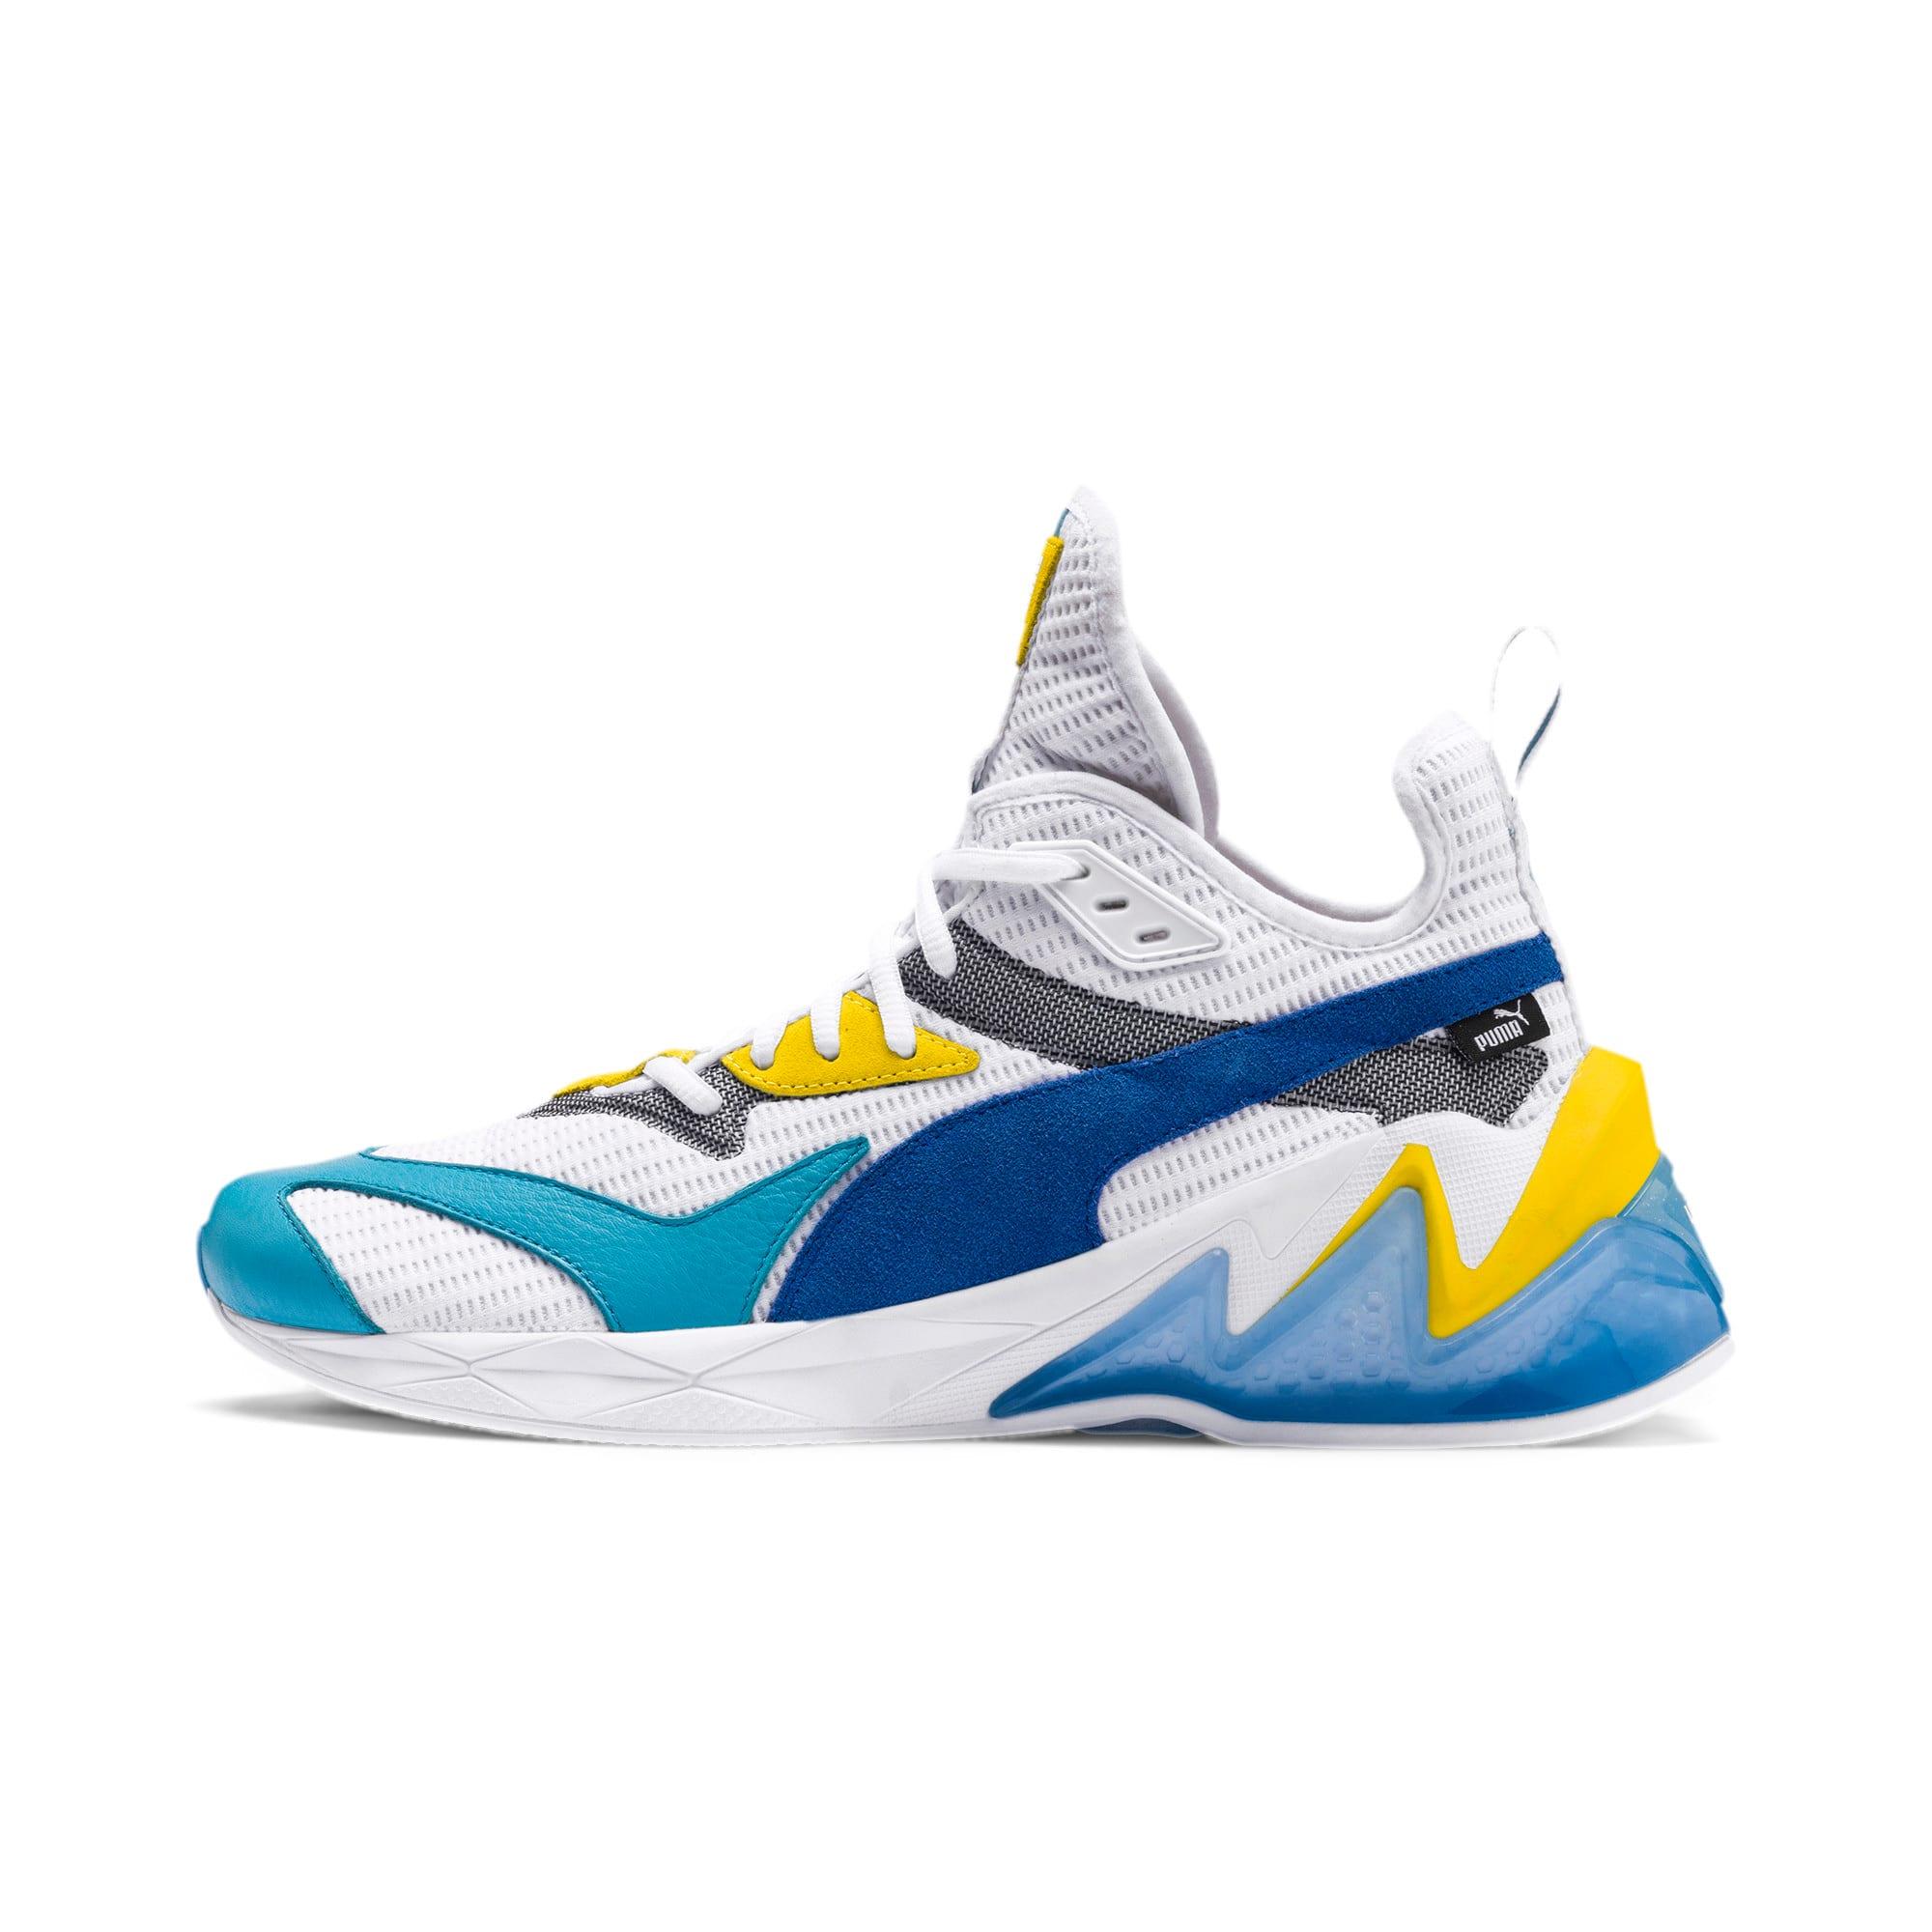 Thumbnail 1 of LQDCELL オリジン, Puma White-B Blue-Blz Yellow, medium-JPN